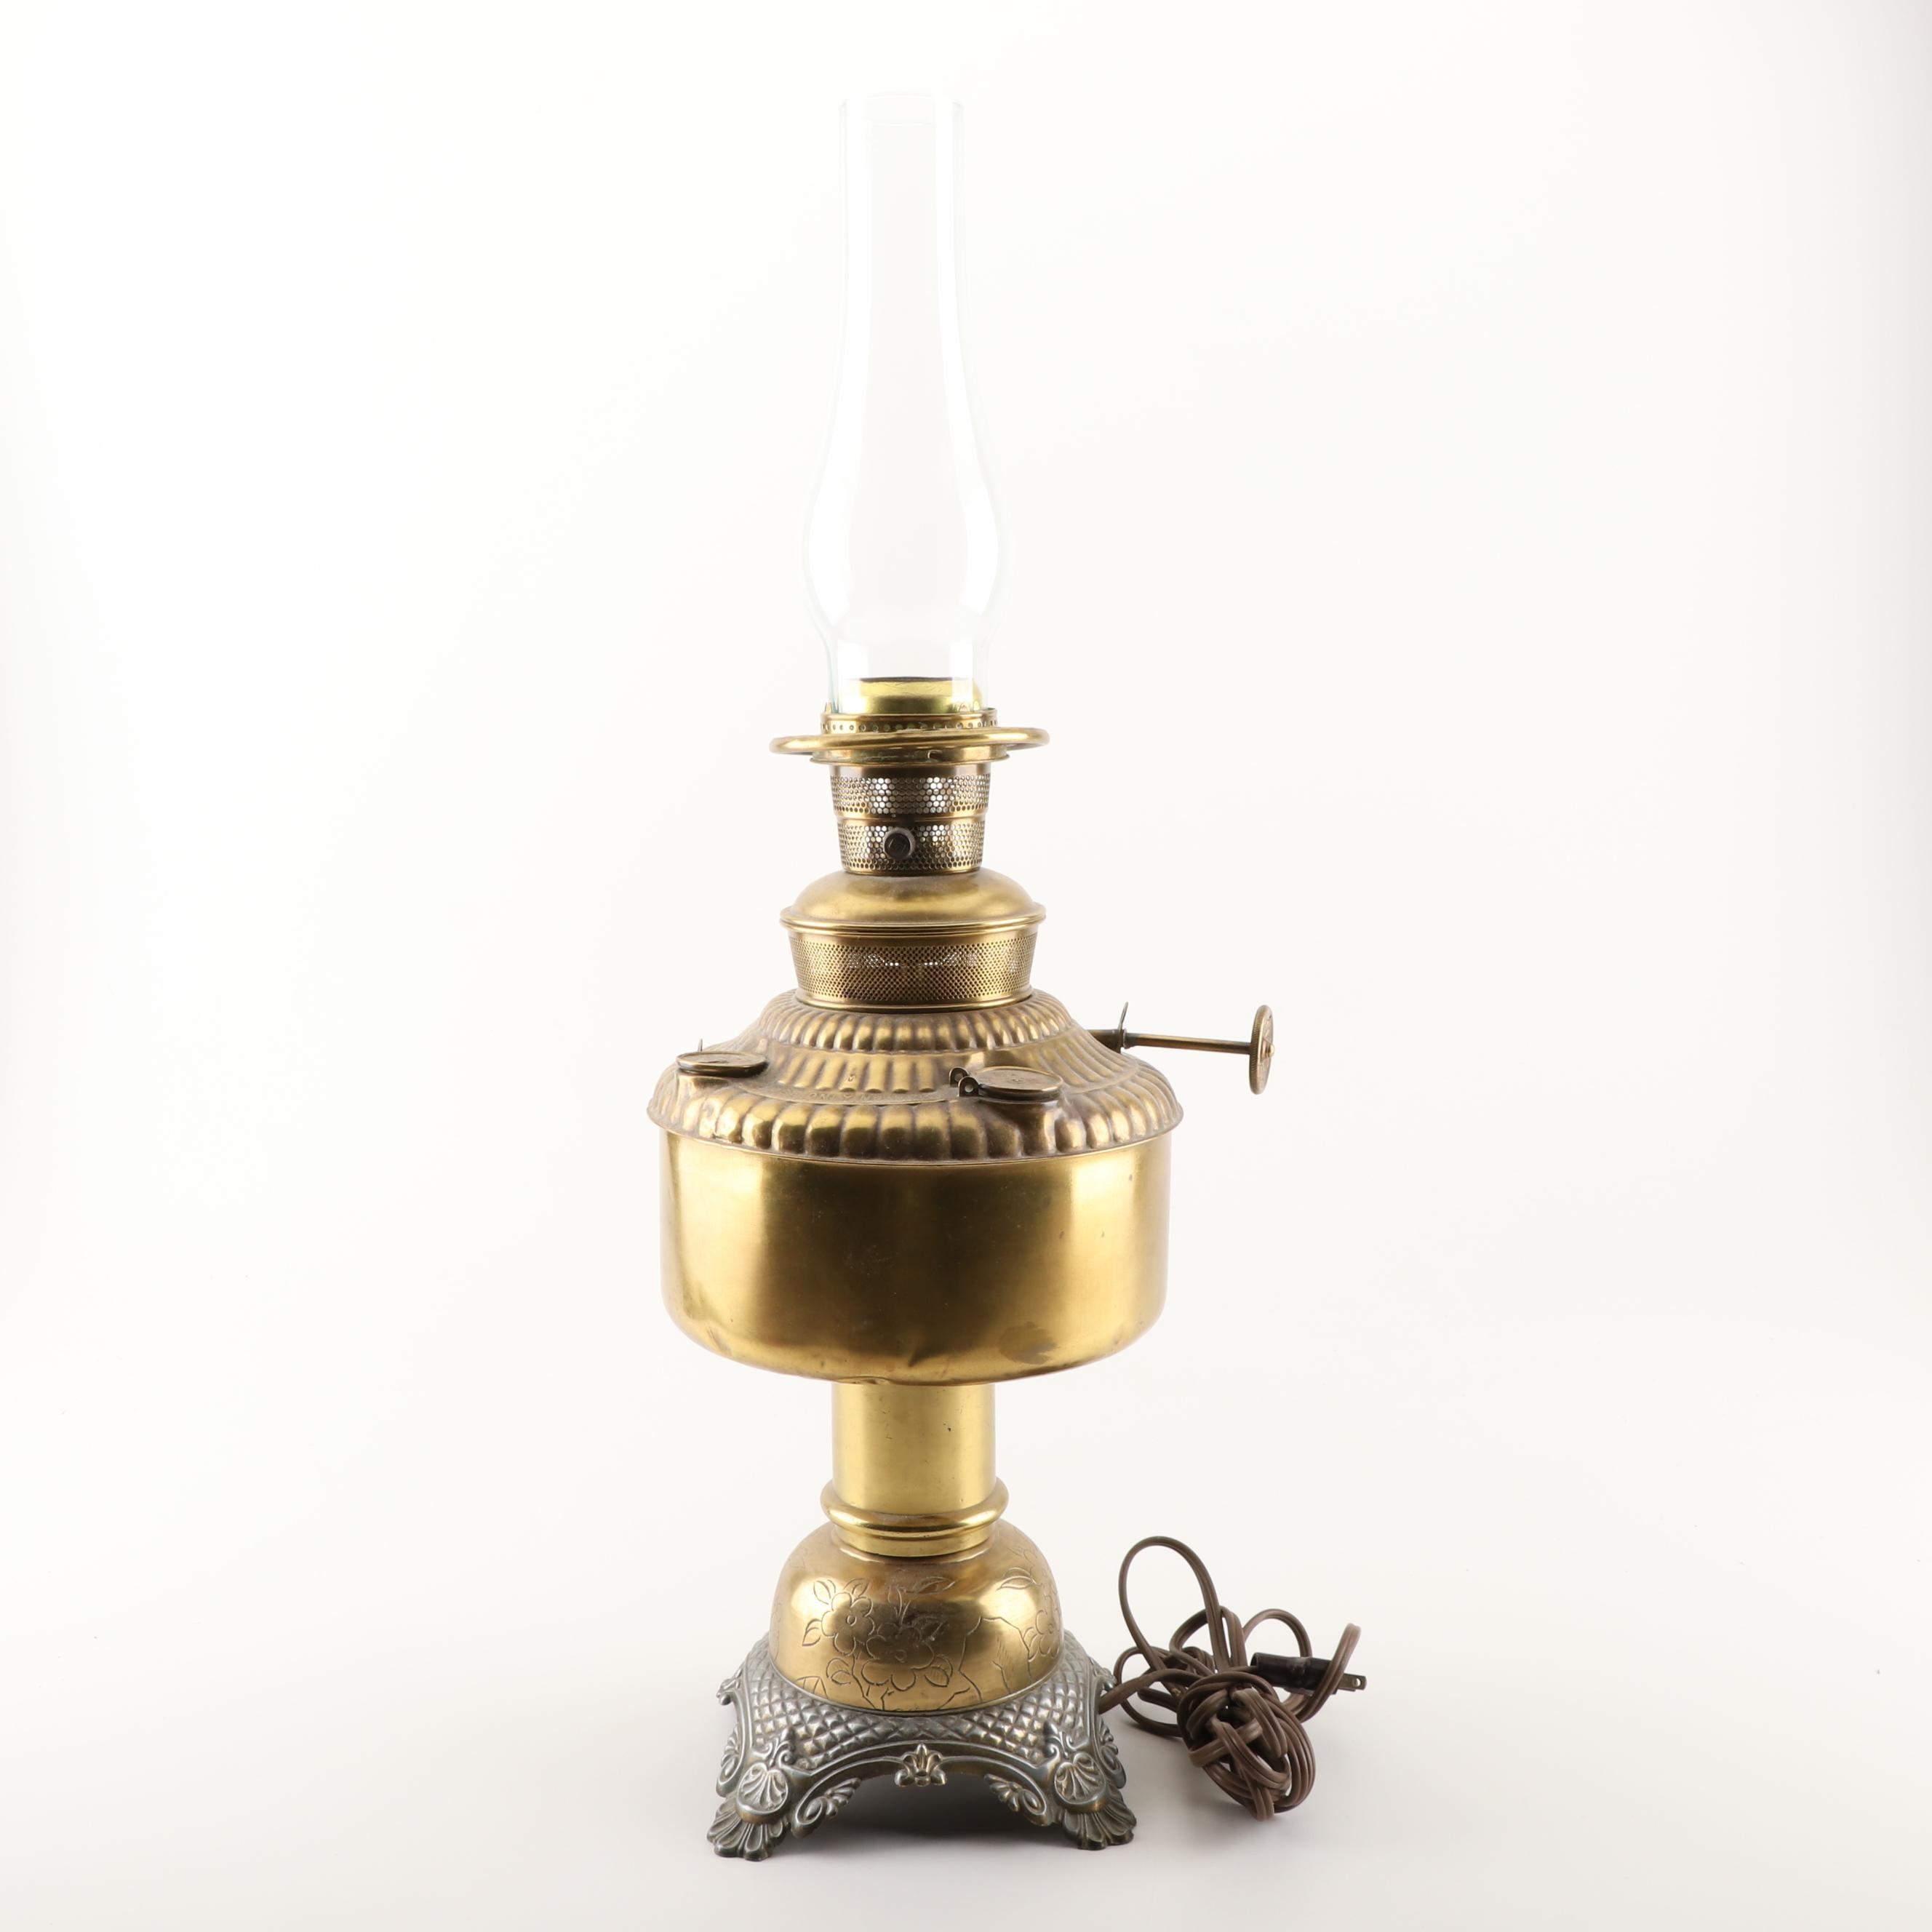 Electrified Brass Kerosene Lamp With B&P Burner, Early 20th Century